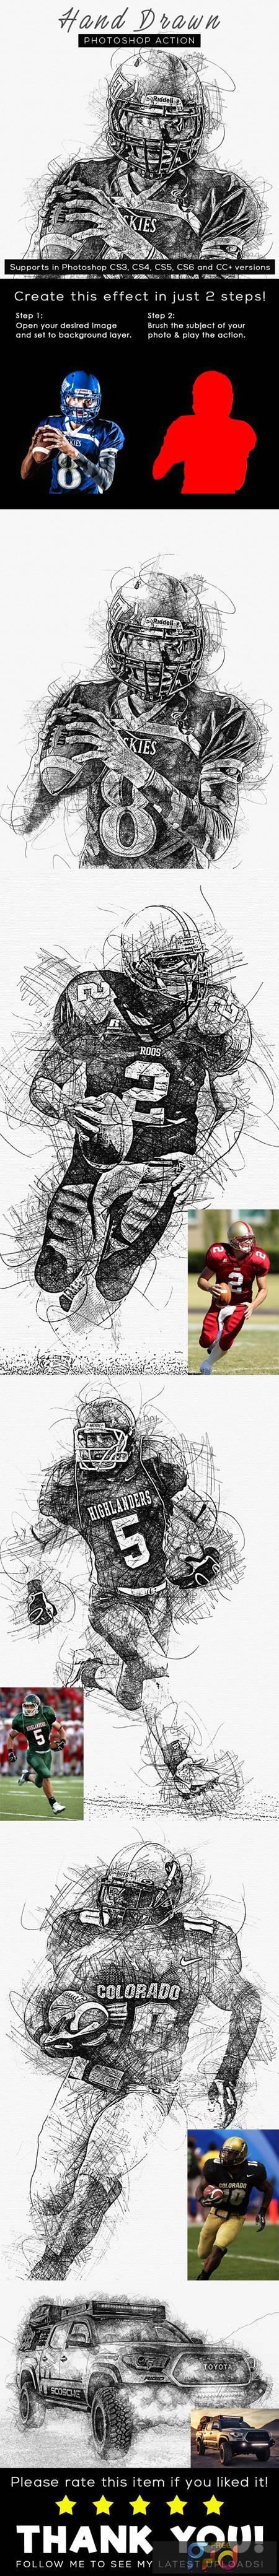 Hand Drawn Photoshop Action 26442003 1